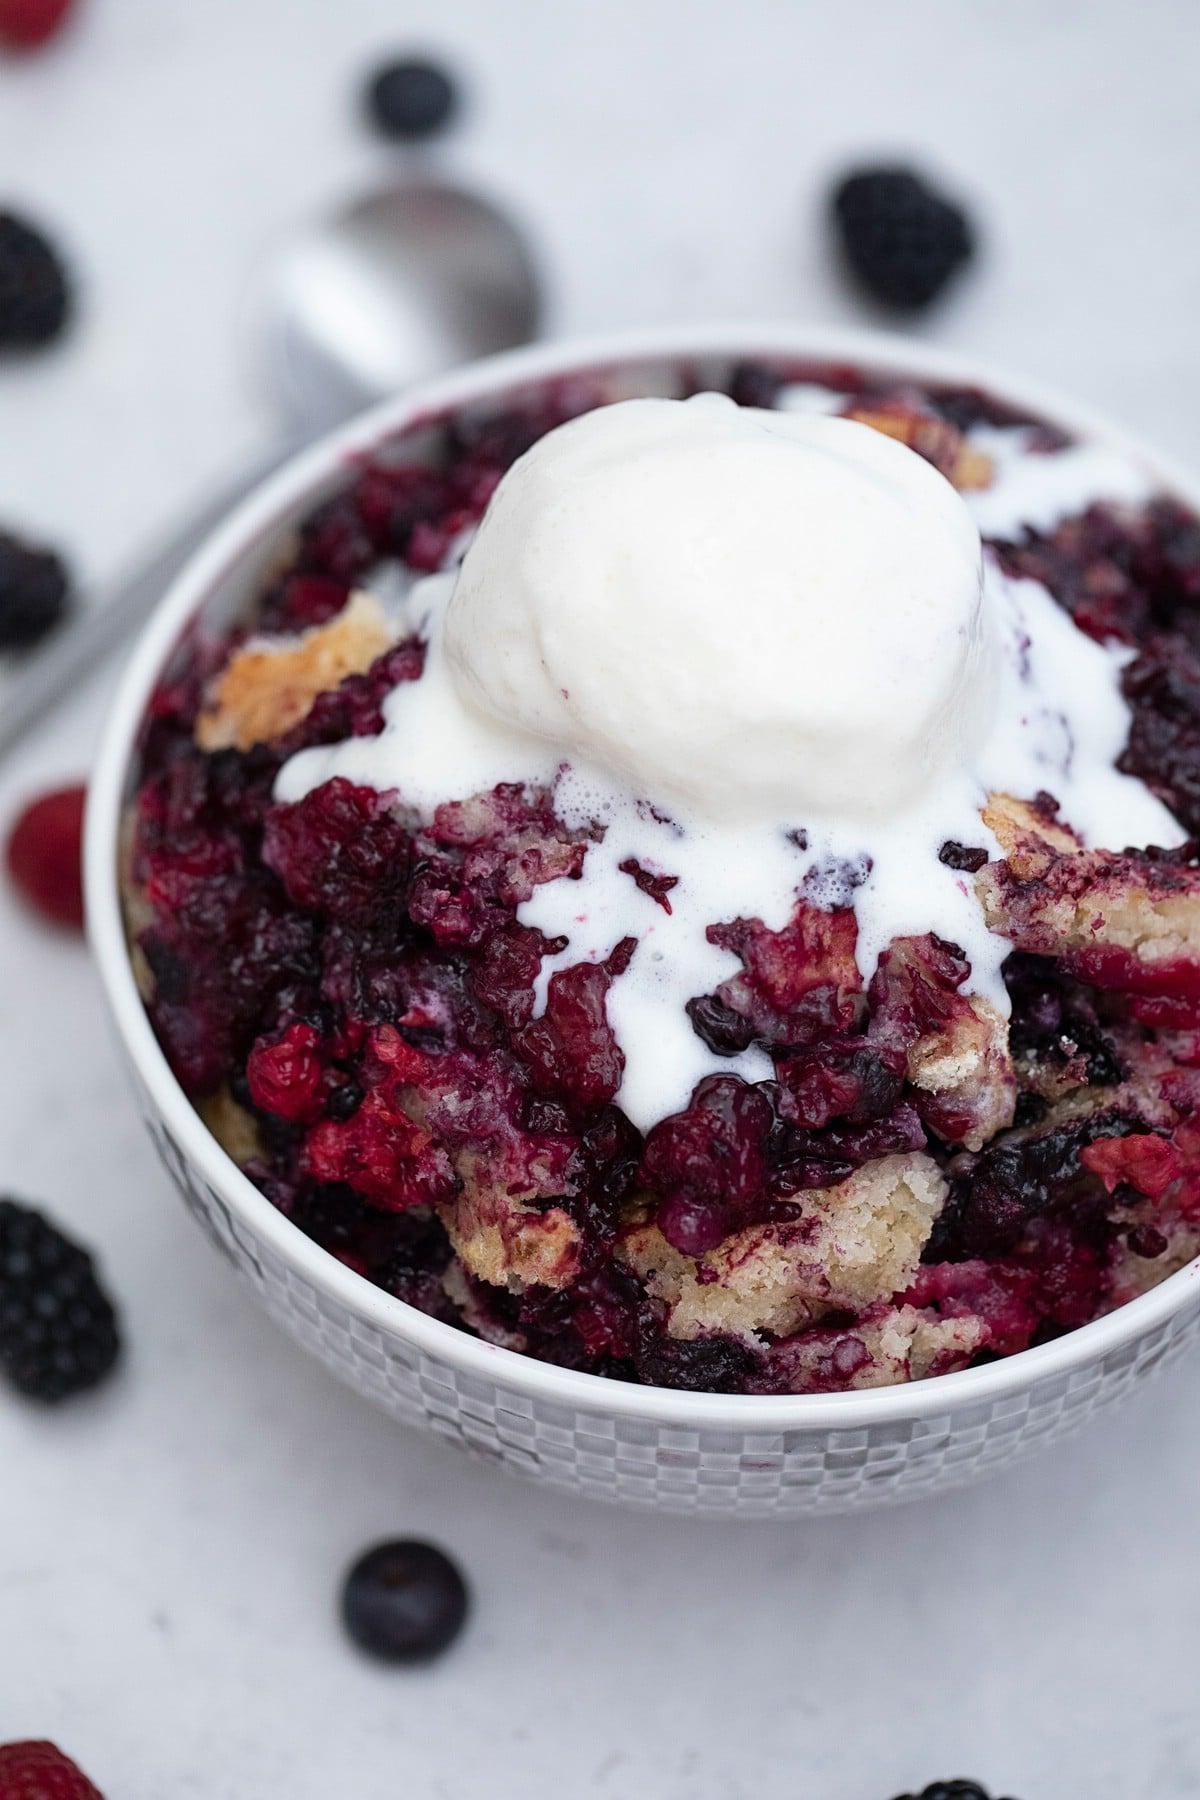 Scoop of ice cream on berry cobbler